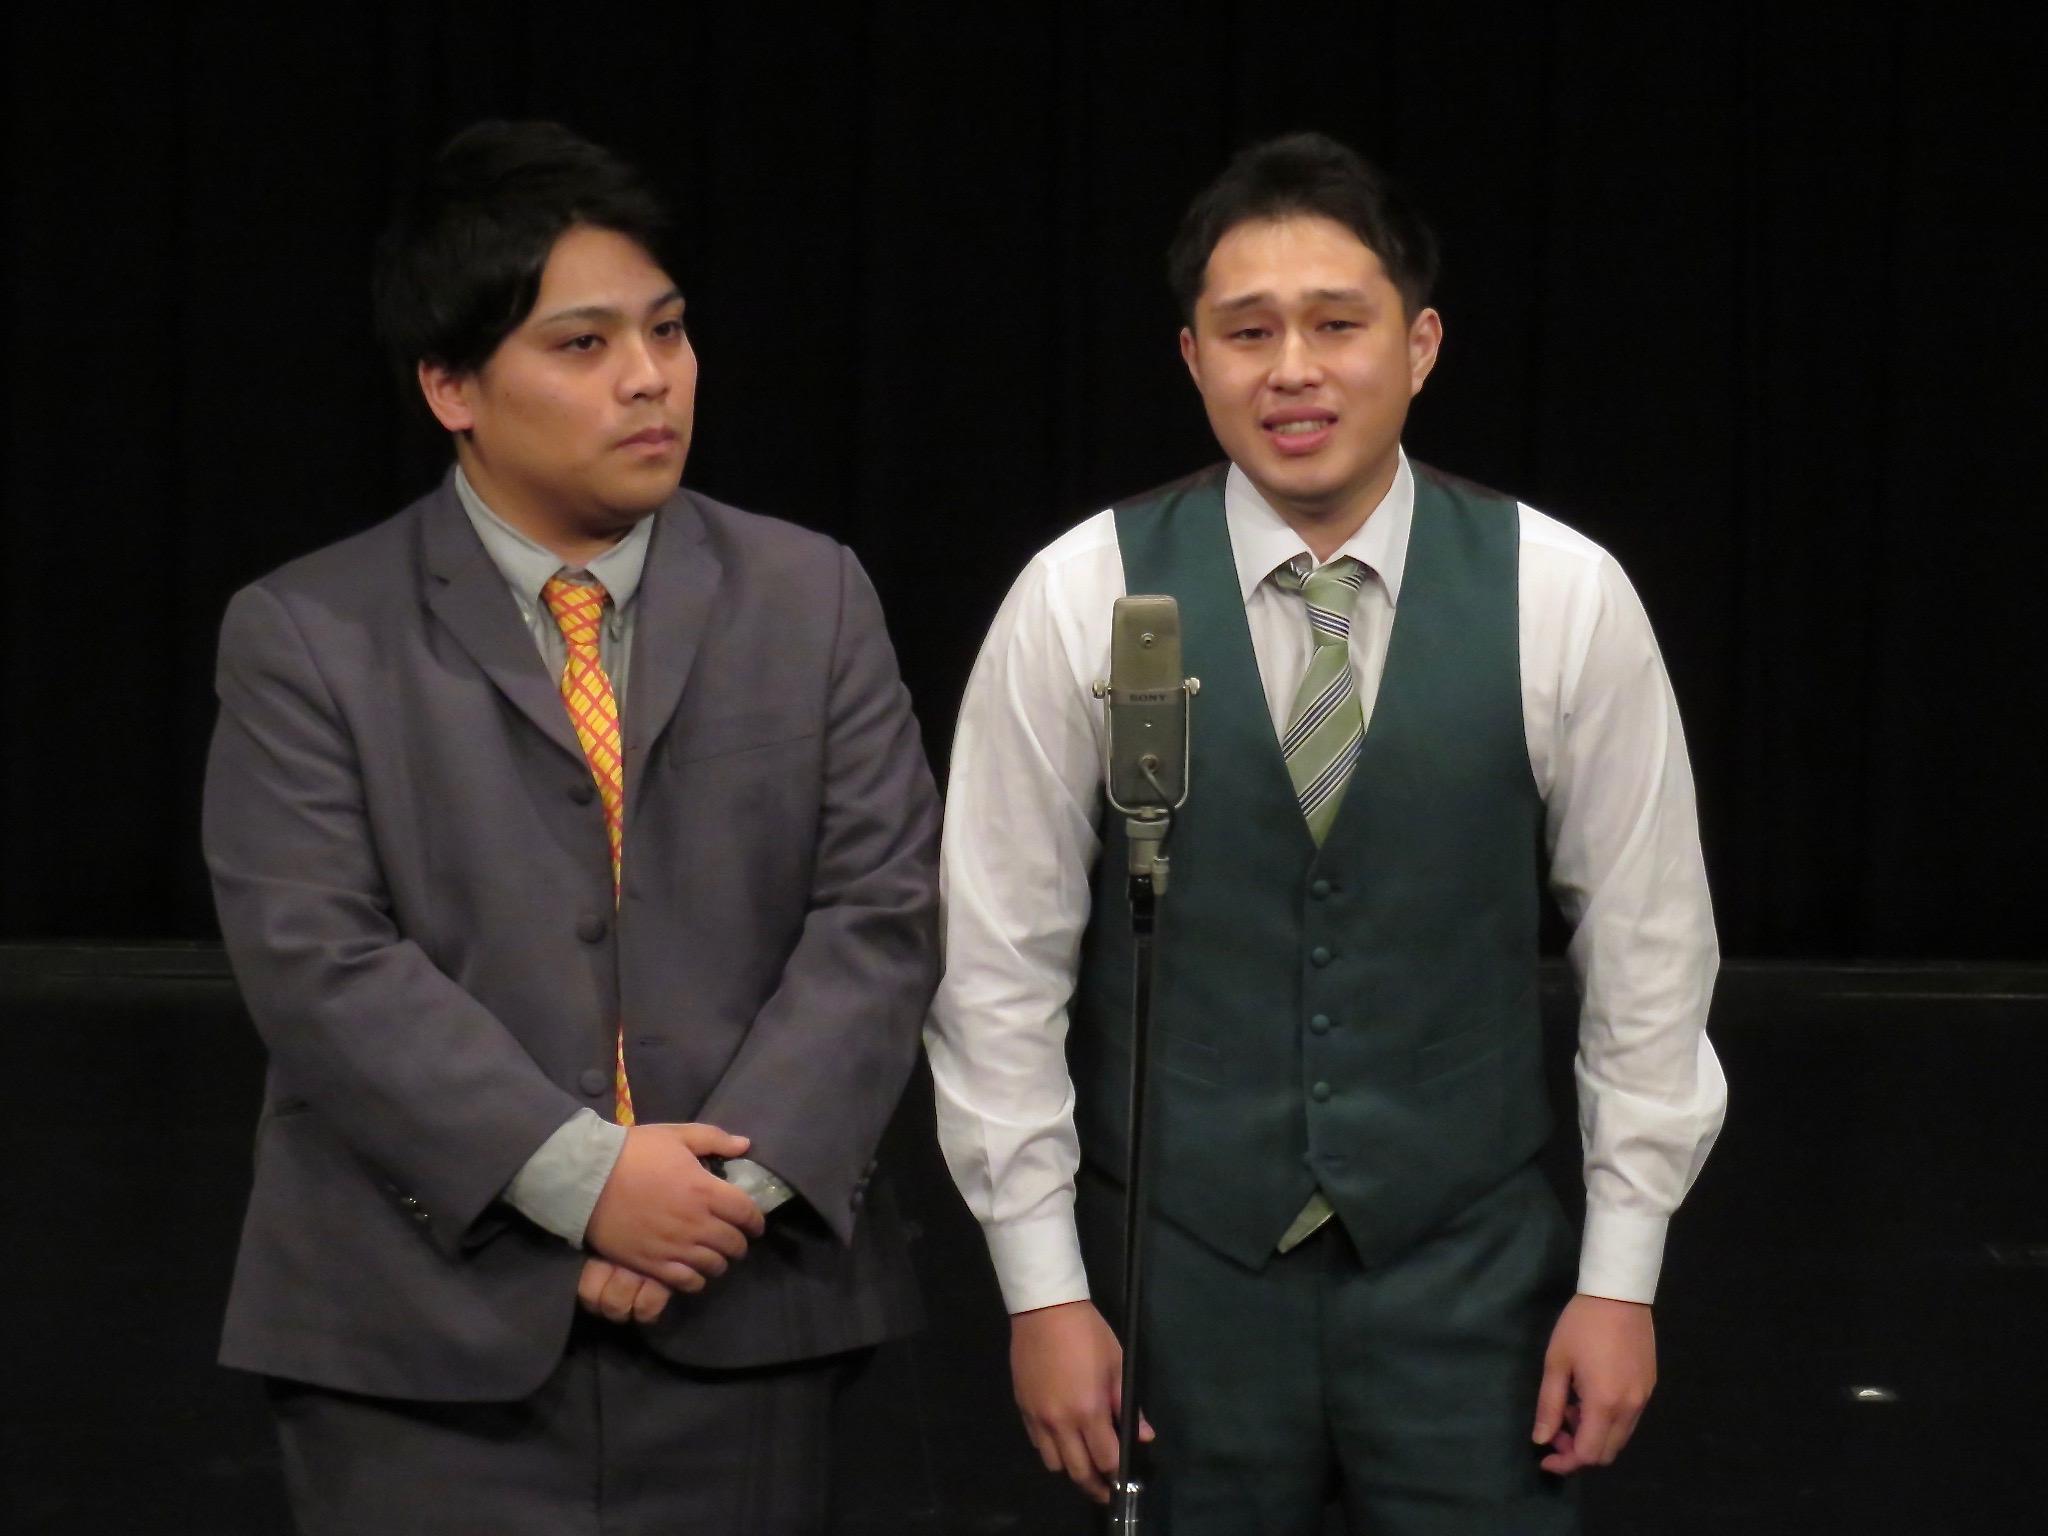 http://news.yoshimoto.co.jp/20181227123303-0cd412df5cbf056c24307118dda4a5dd9ed3ed7f.jpeg